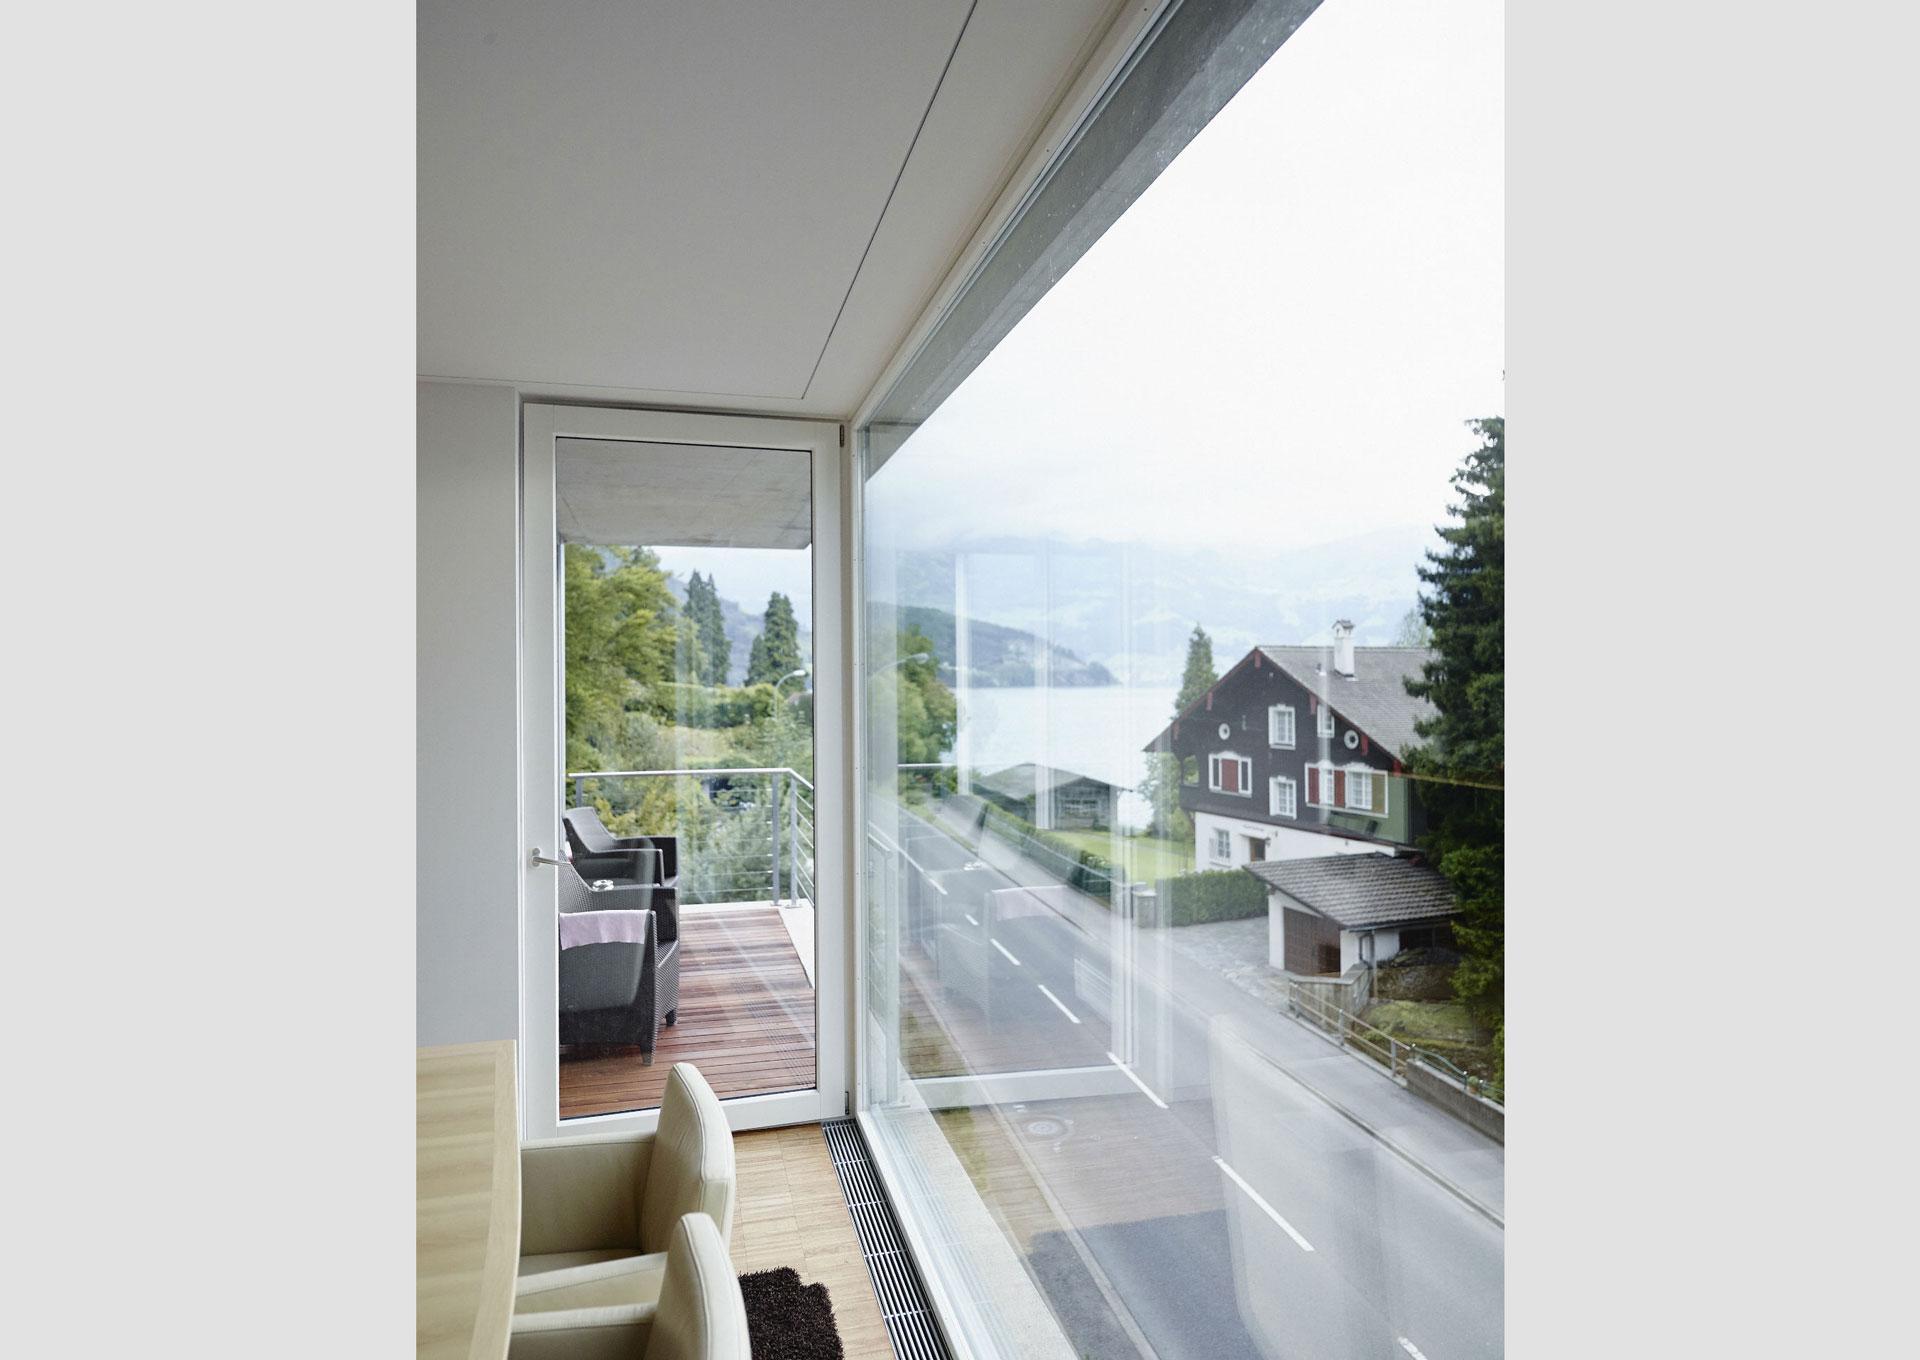 mondrianHouse-lakesidedevelopment-lsd-swiss-5-2